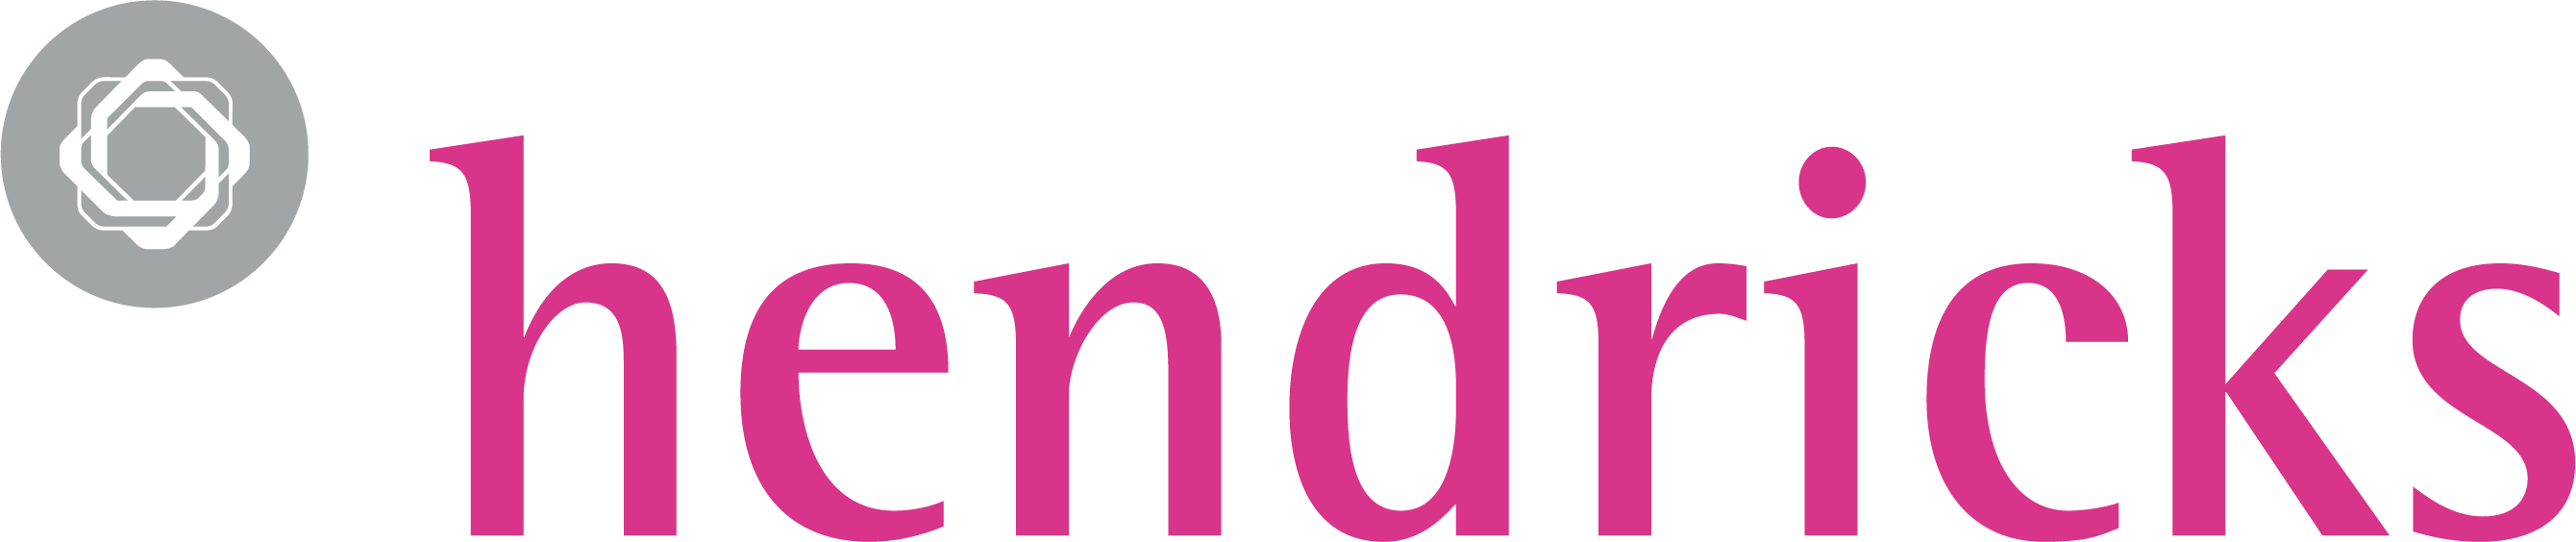 hendricks GmbH Logo